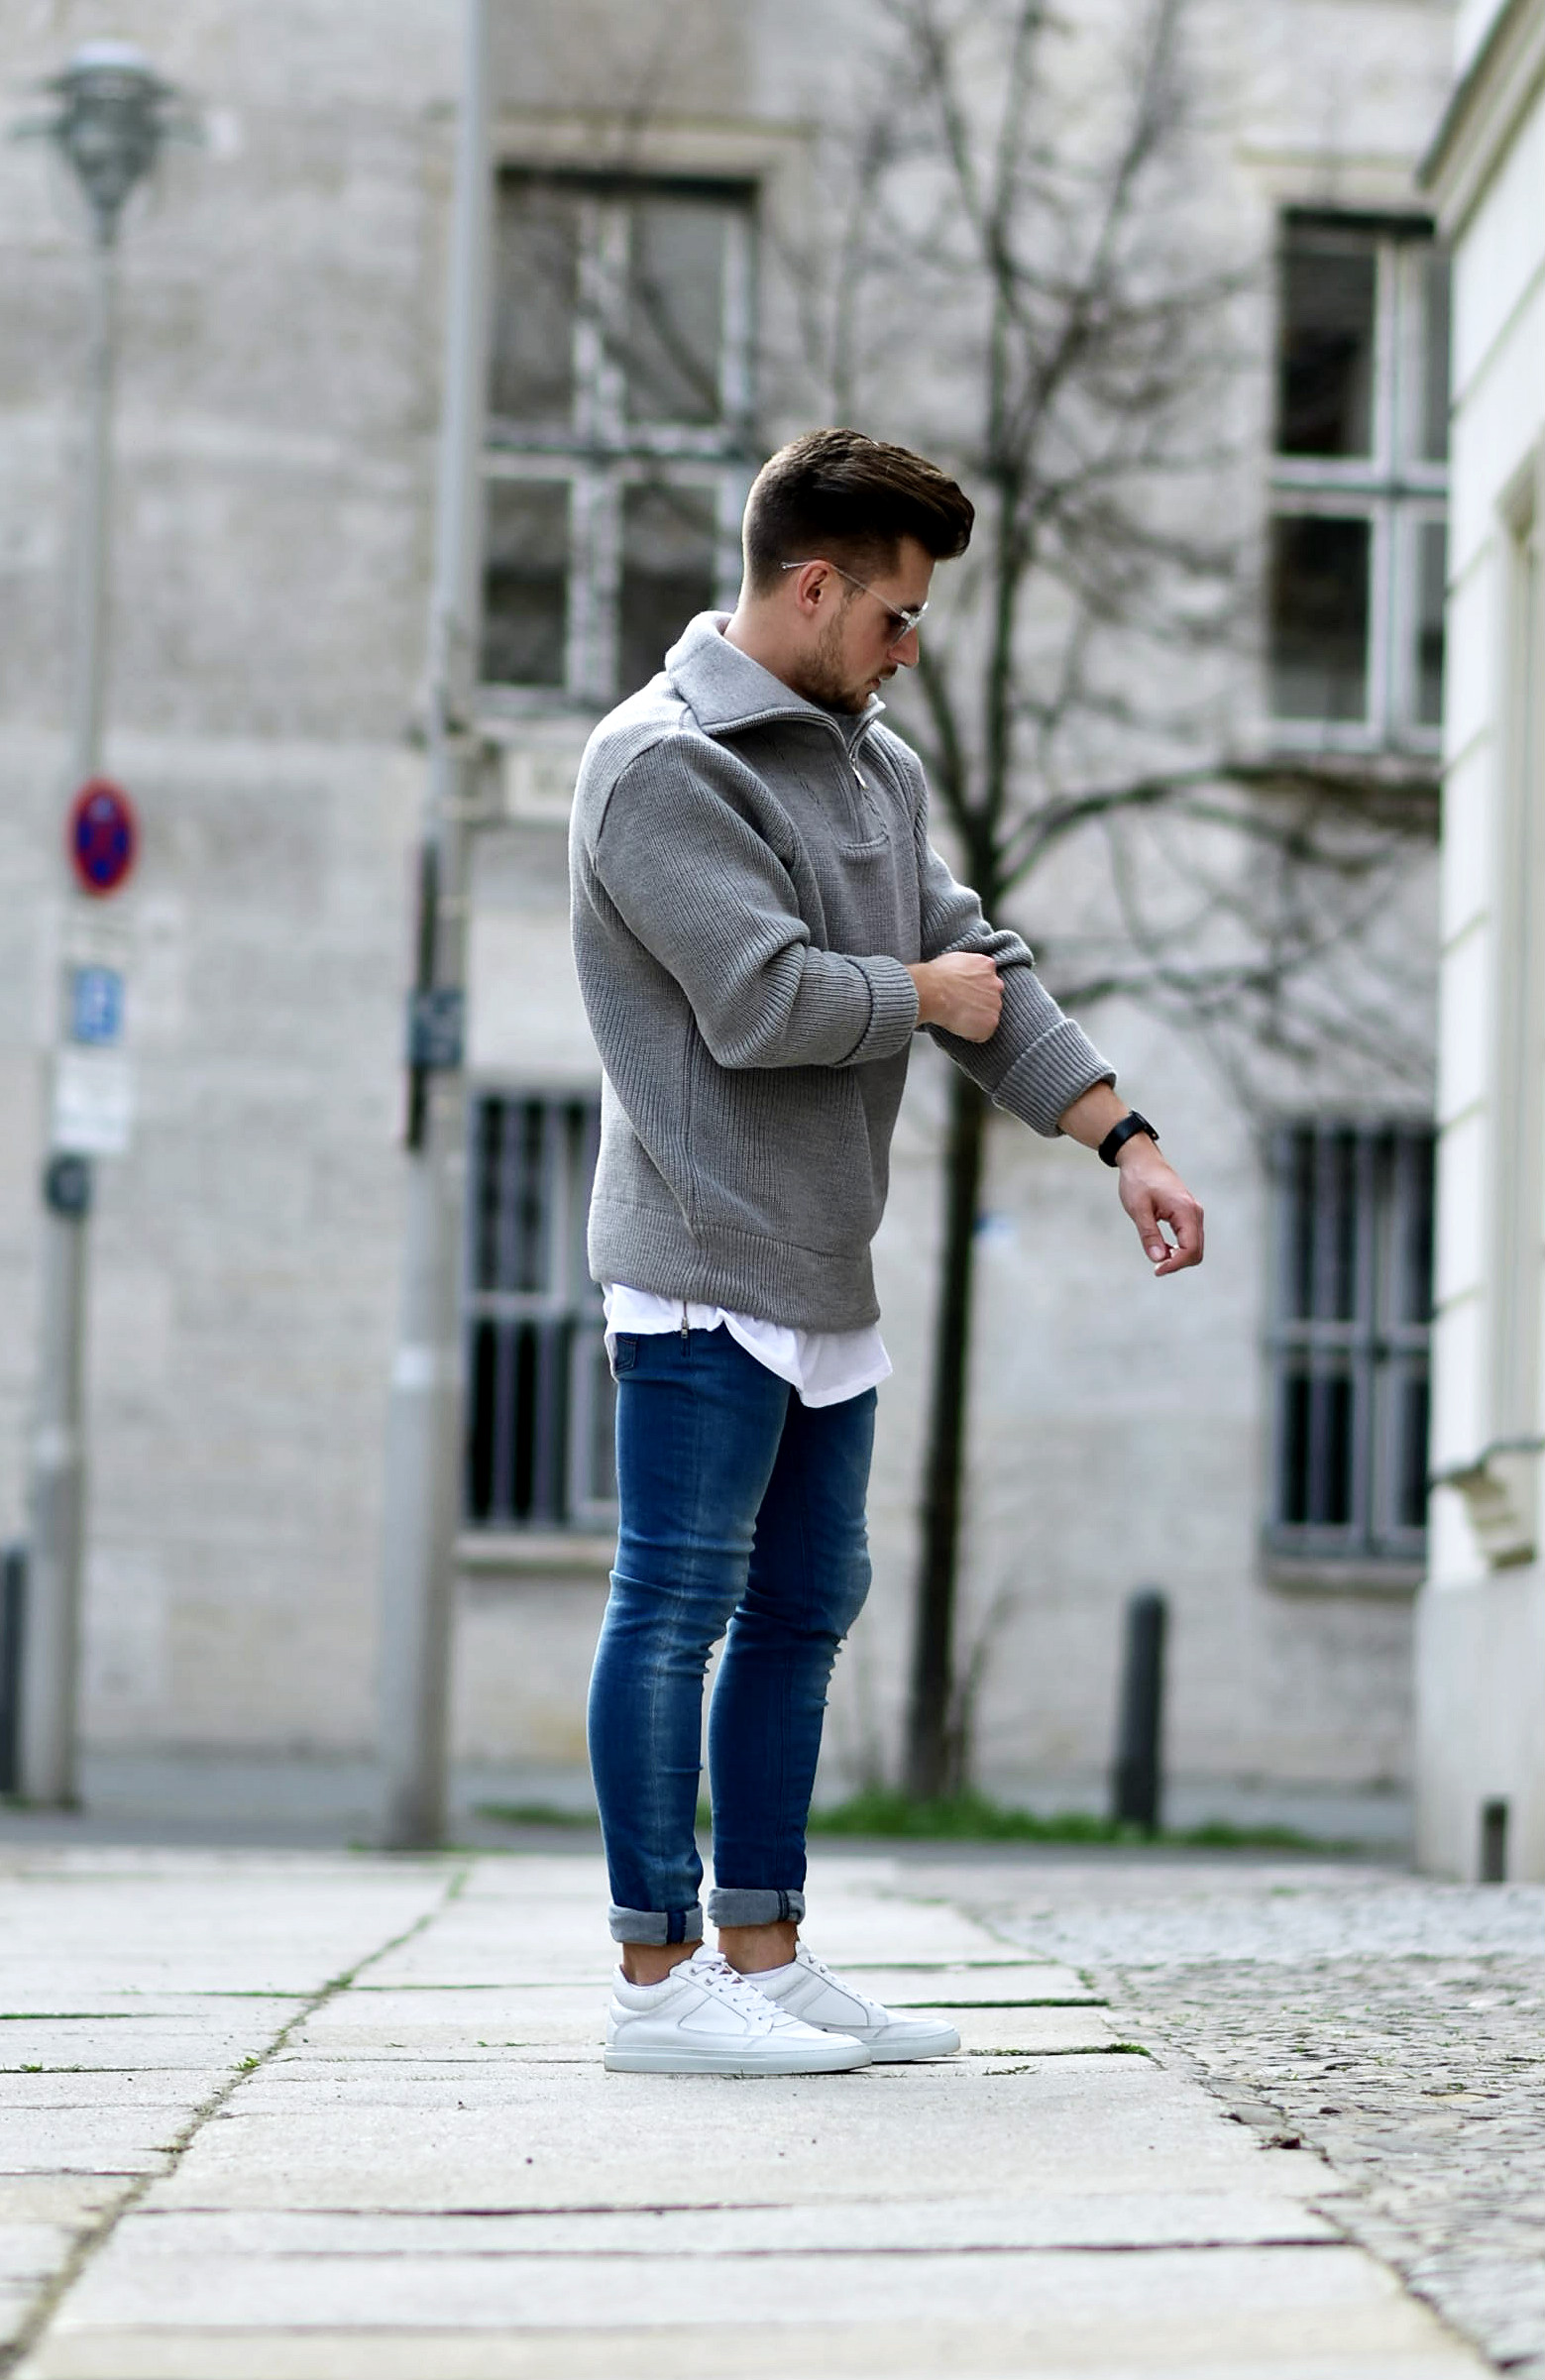 Tommeezjerry-Styleblog-Männerblog-Männer-Modeblog-Berlin-Berlinblog-Outfit-Streetlook-Skinny-Jeans-Rymhart-Troyer-Sweater-Sonnenbrille-Threat-Etiquette